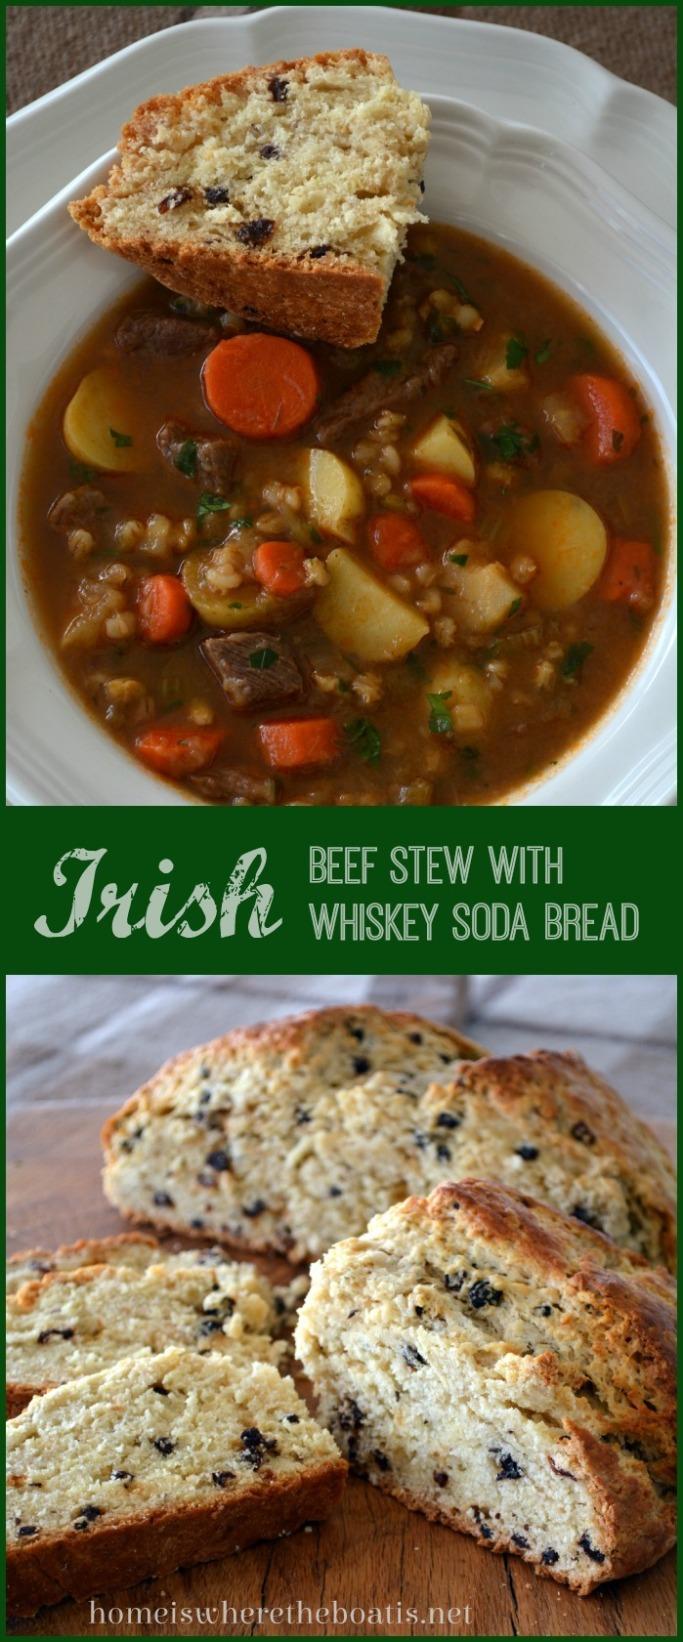 Irish Beef Stew with Irish Whiskey Soda Bread